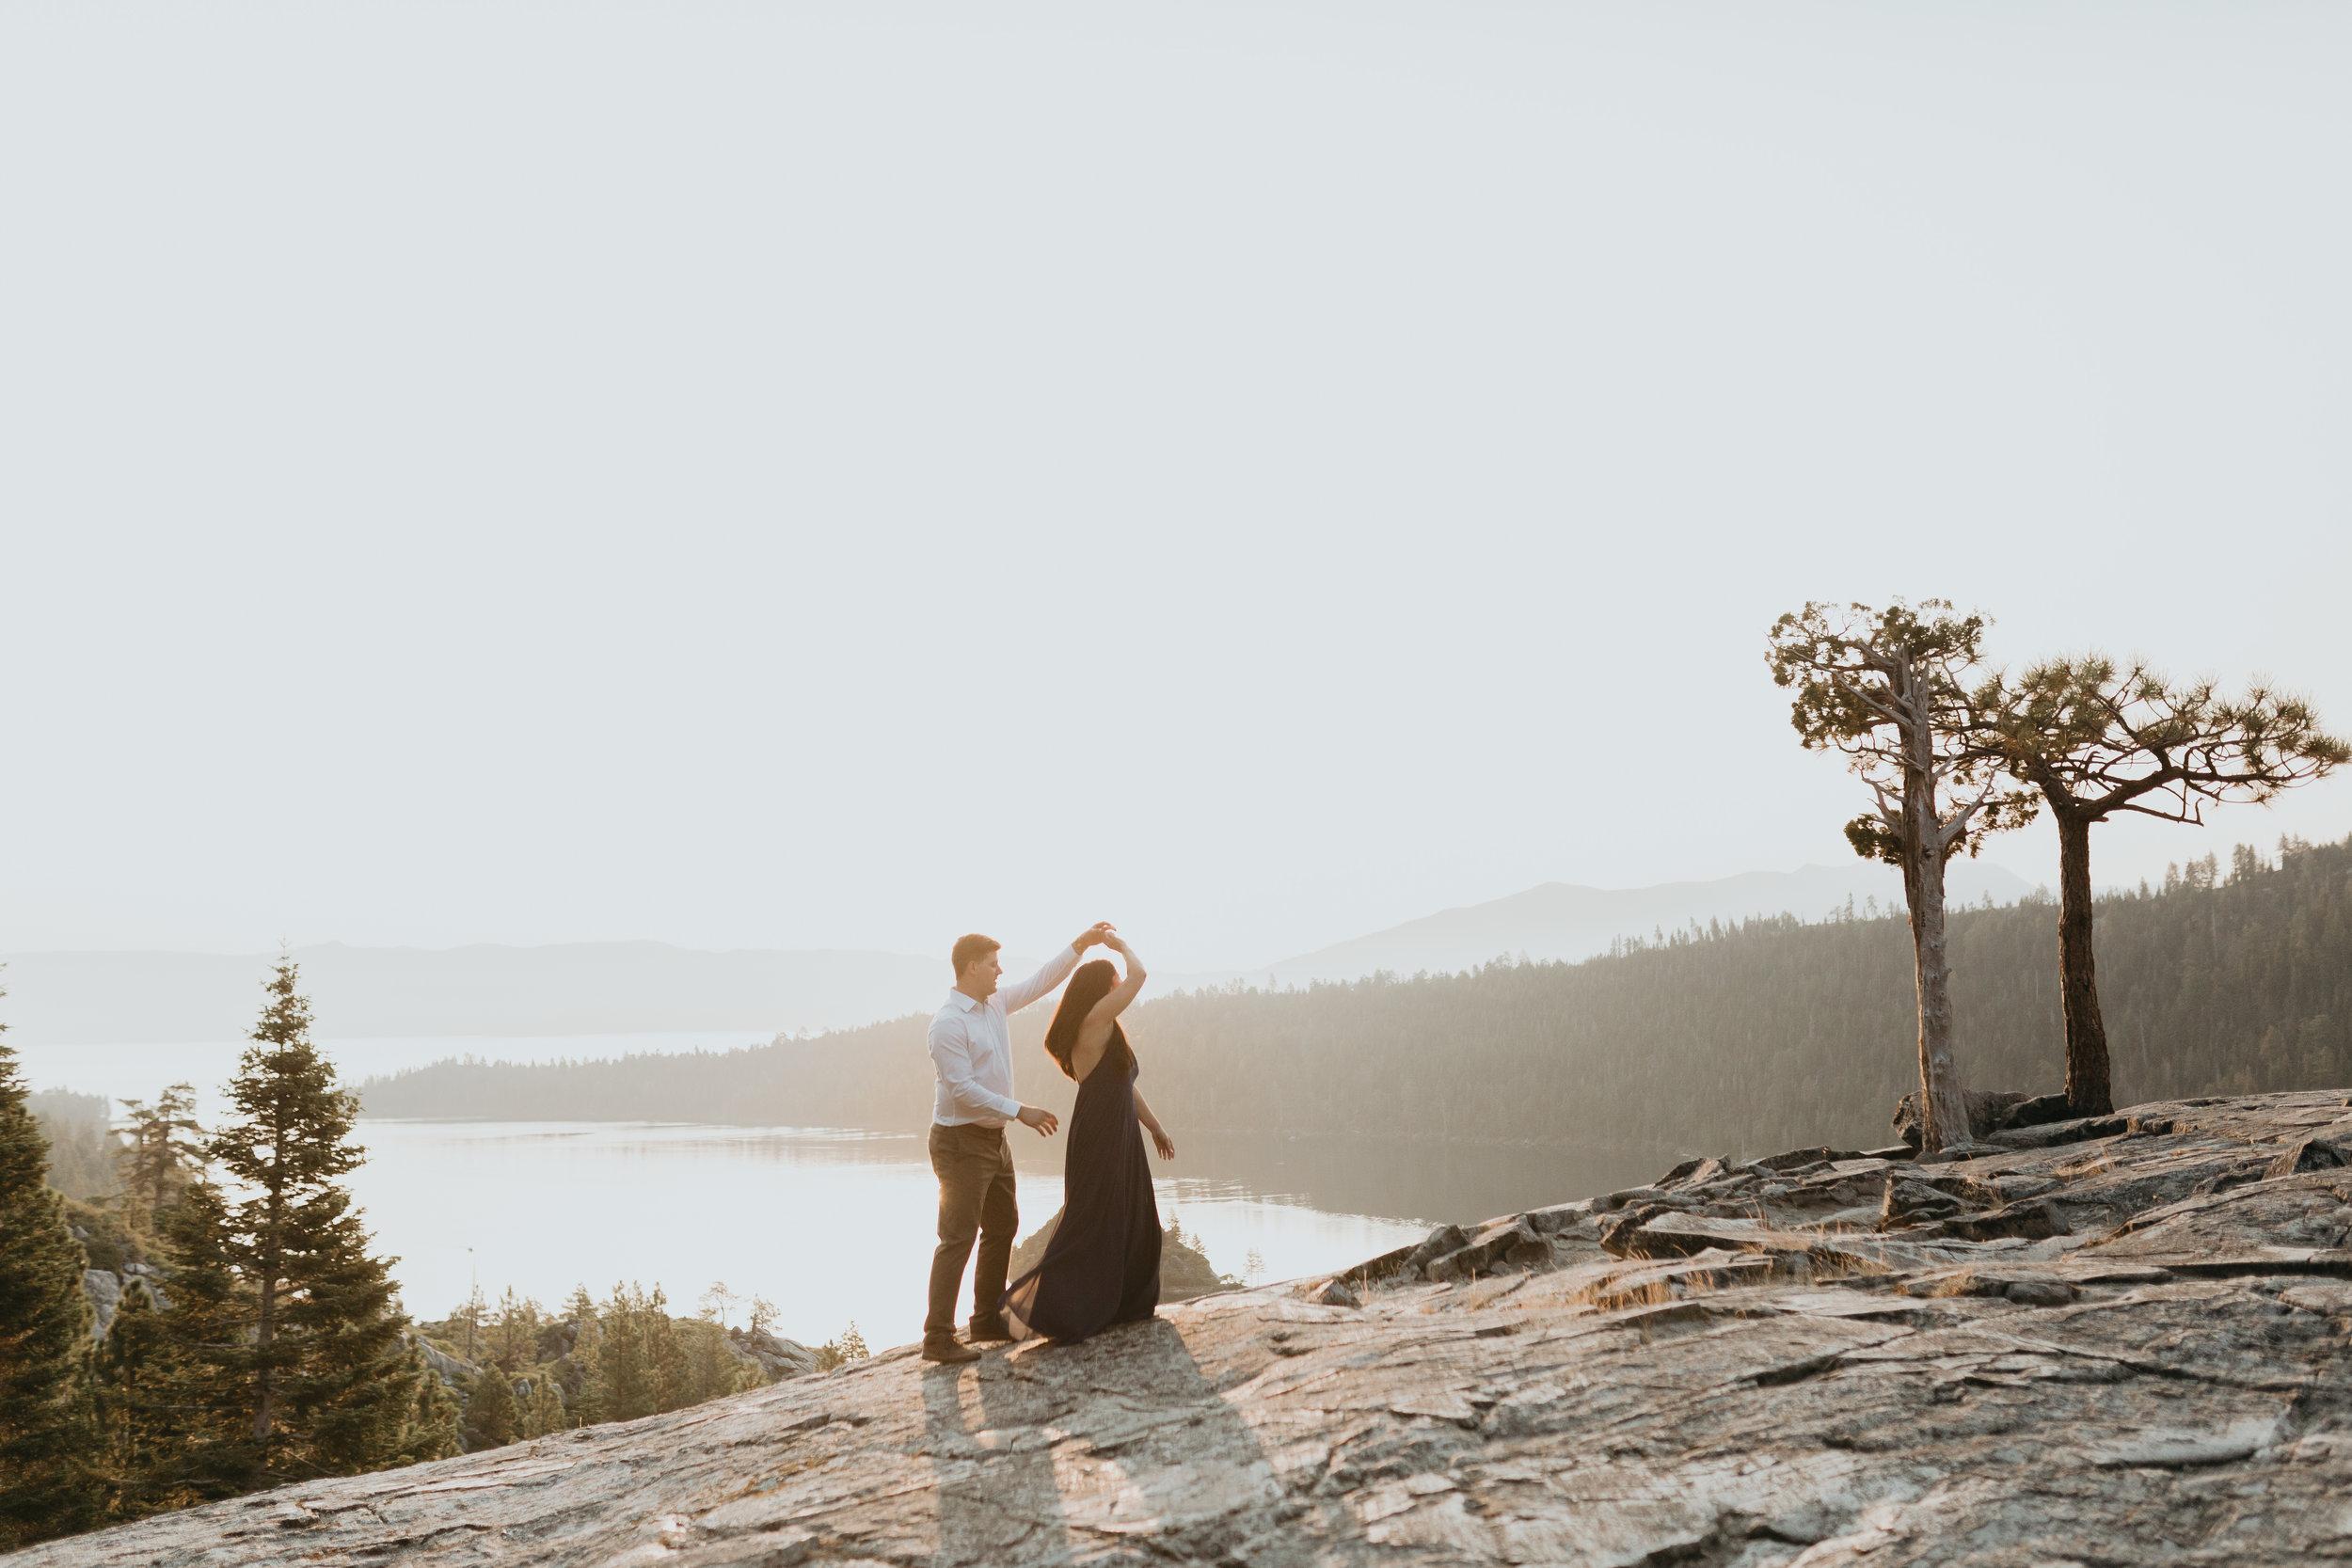 nicole-daacke-photography-lake-tahoe-sunrise-summer-adventure-engagement-photos-nevada-wedding-elopement-photographer-golden-emerald-bay-light-pine-trees-summer-vibe-fun-carefree-authentic-love-33.jpg